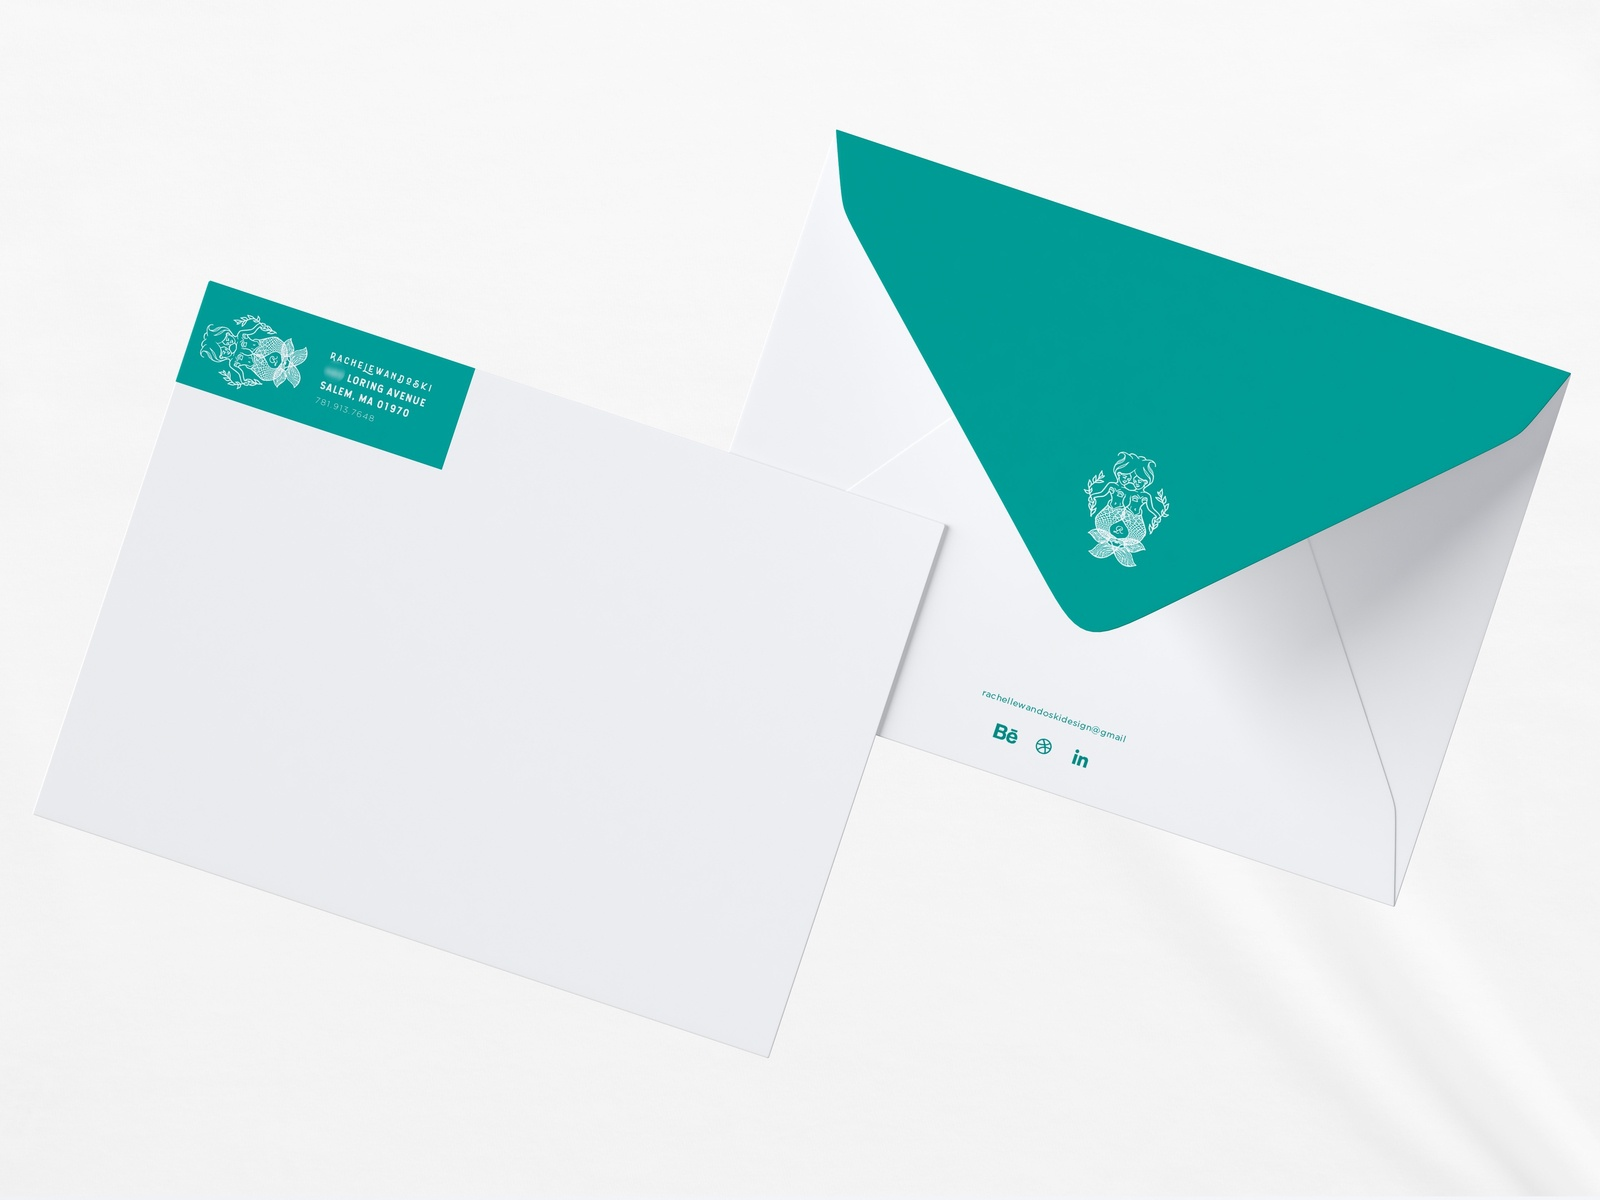 rl label envelope 1 5 by rachel lewandoski dribbble dribbble